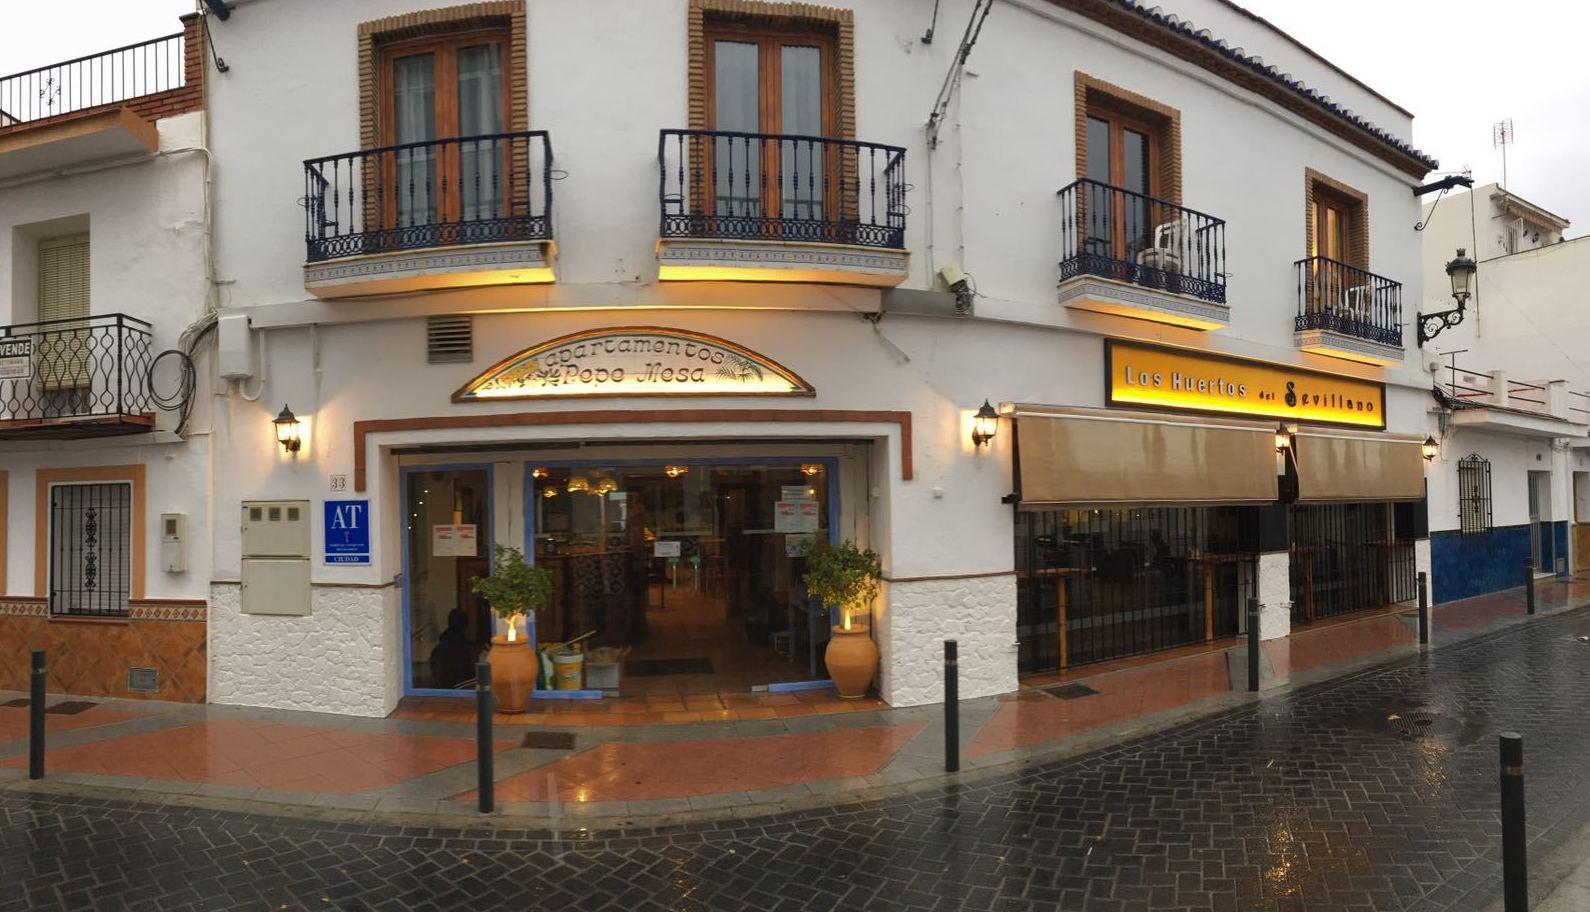 Foto 3 de Cocina andaluza en Nerja | Restaurante Rincón del Sevillano